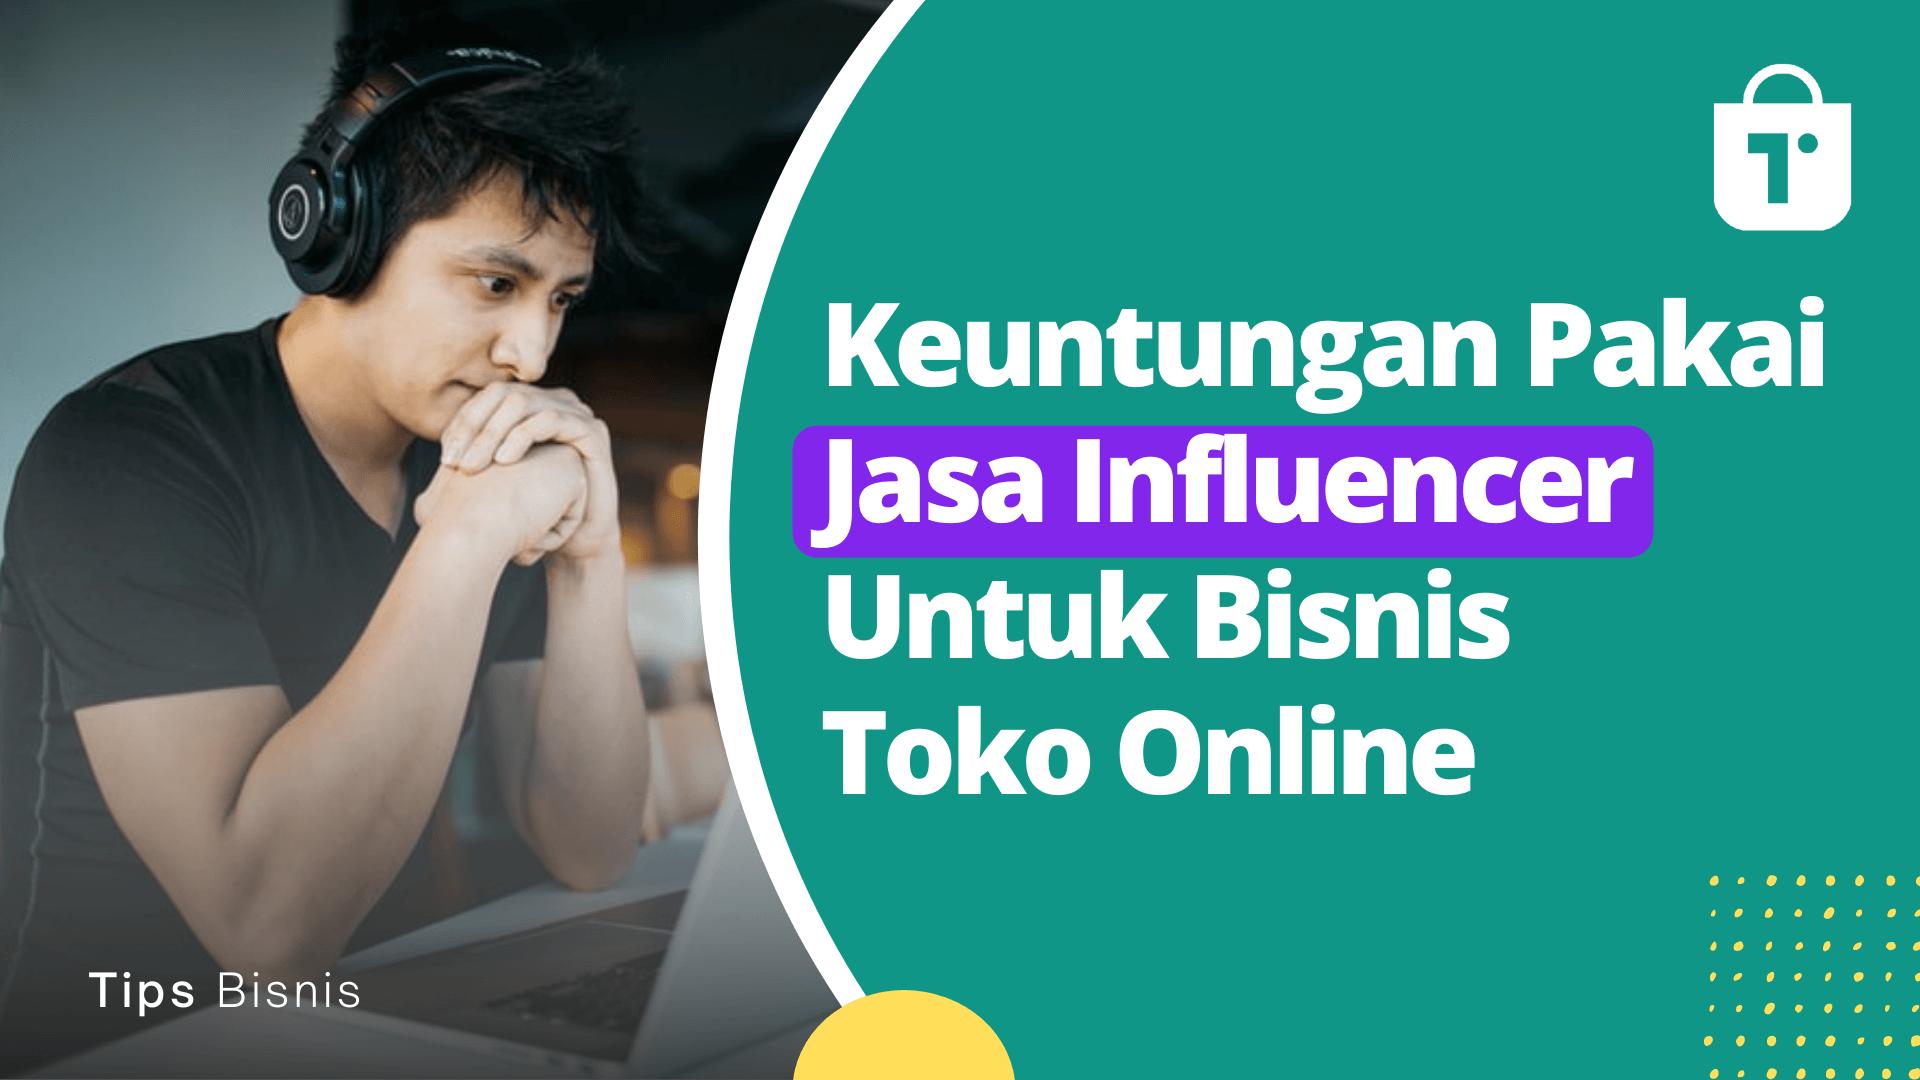 Keuntungan Pakai Jasa Influencer Untuk Bisnis Toko Online